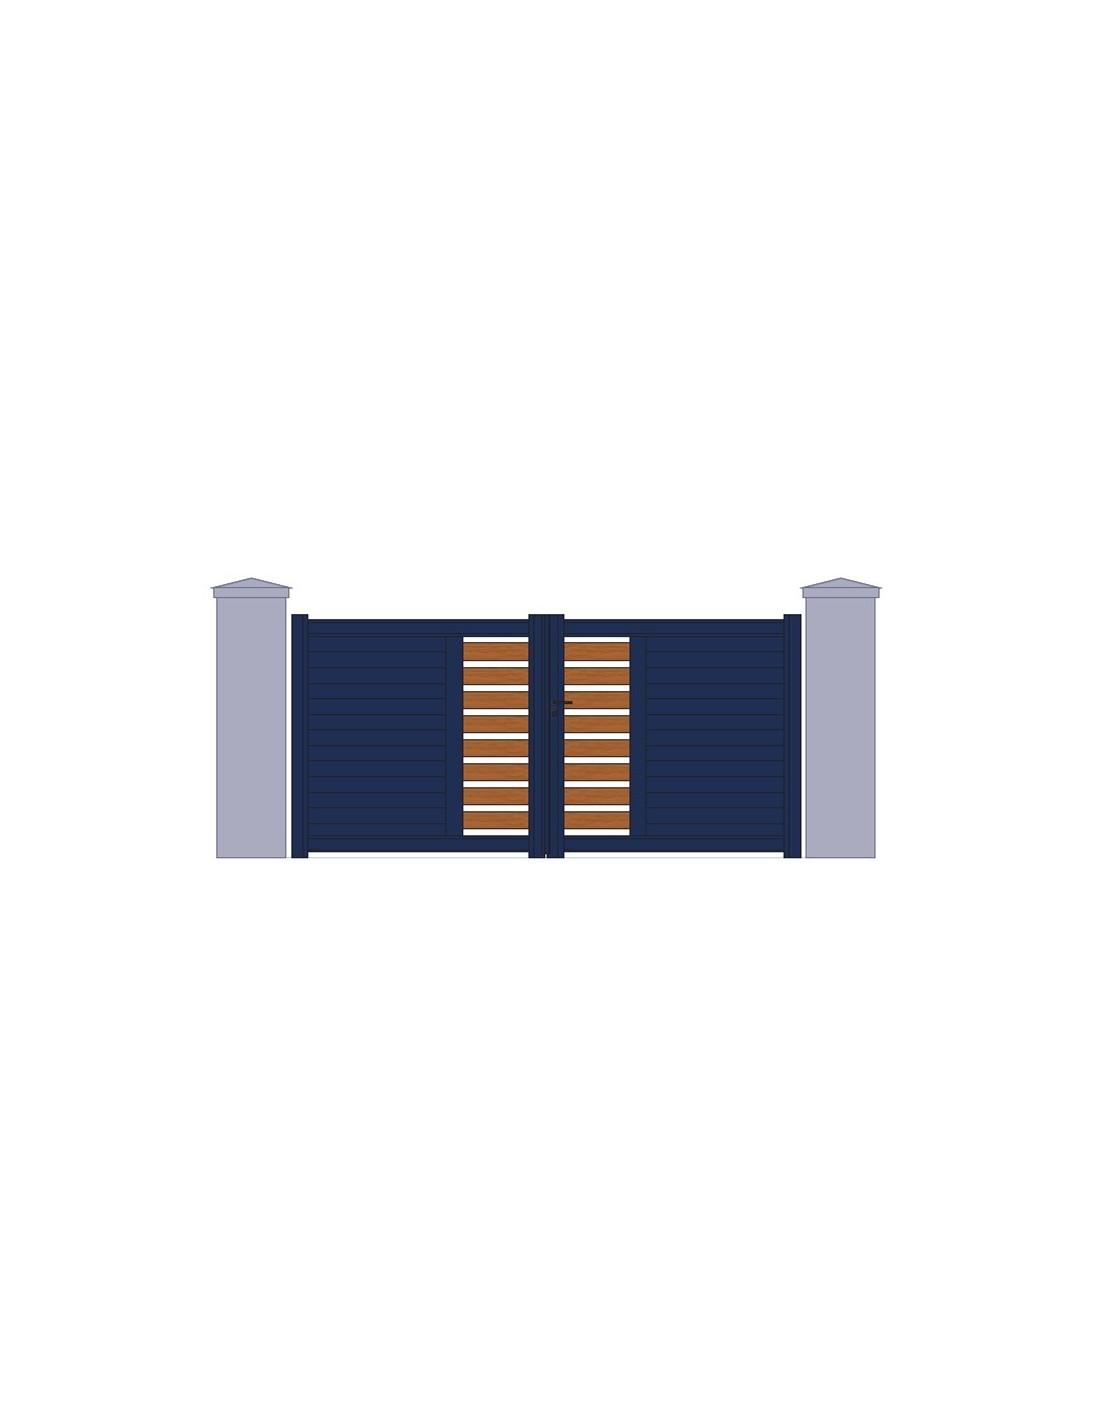 portail alu et red cedar largeur 3m00 a 4m50. Black Bedroom Furniture Sets. Home Design Ideas